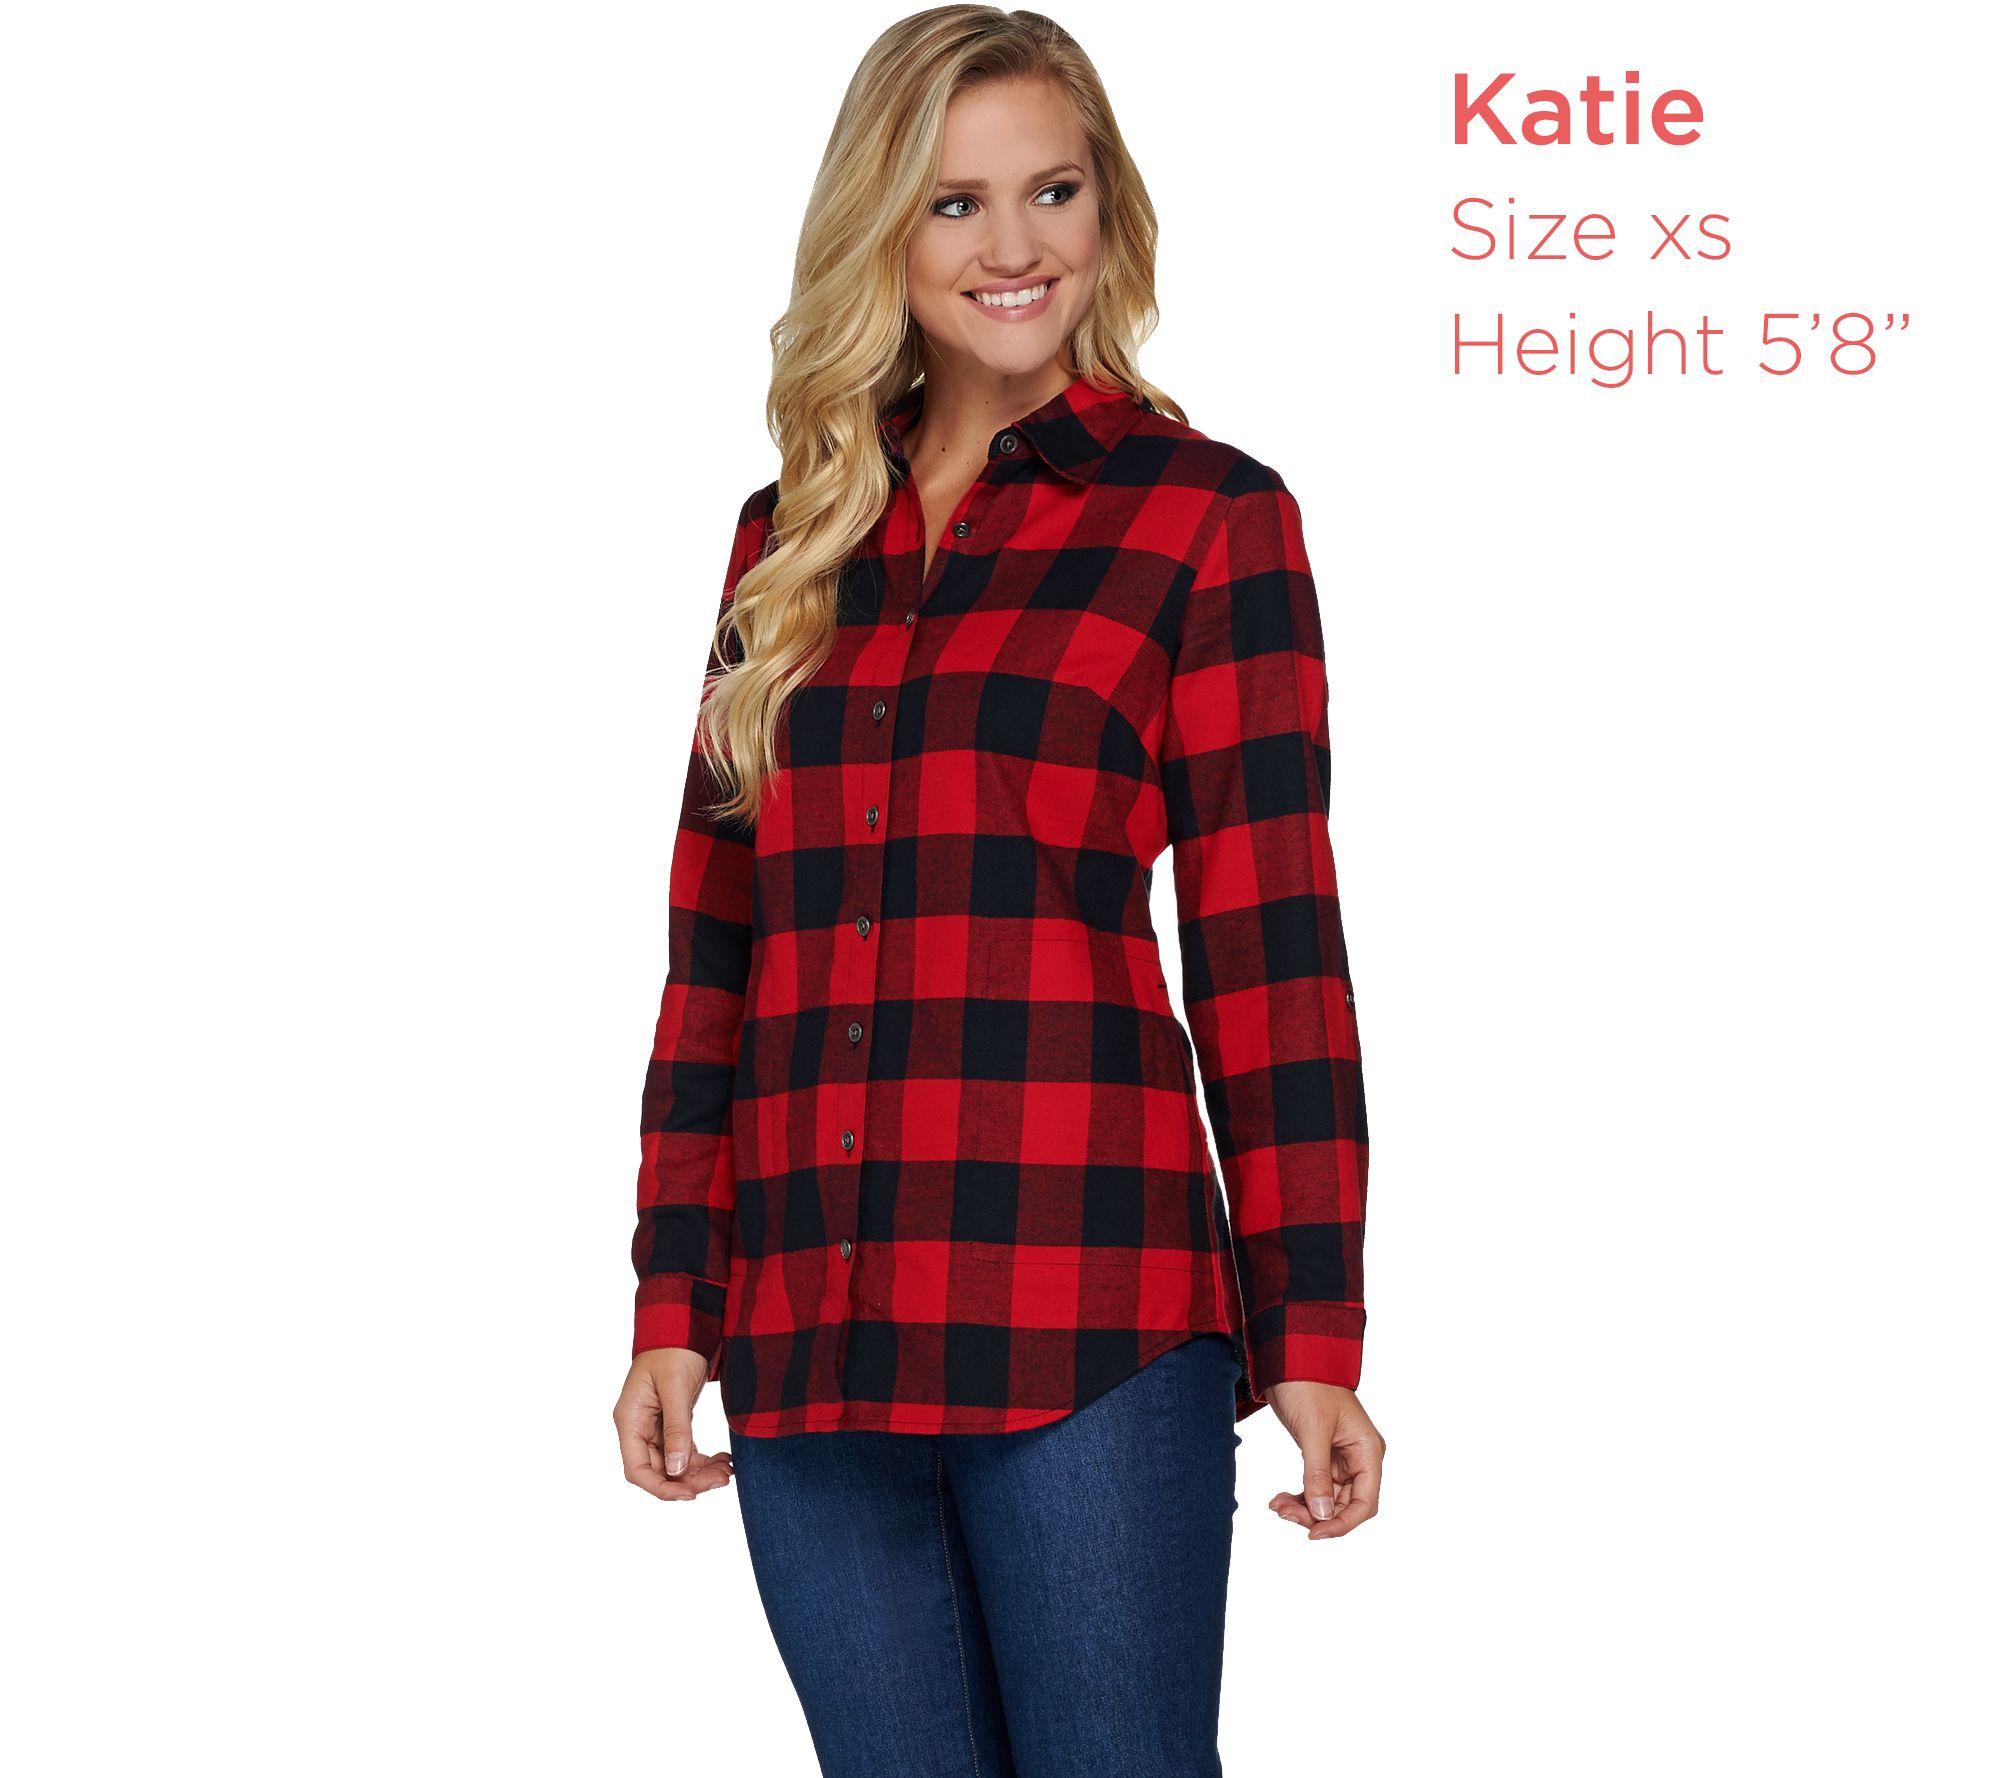 c7cb9e46c13 Womens Red And Black Plaid Shirt - ShopStyle